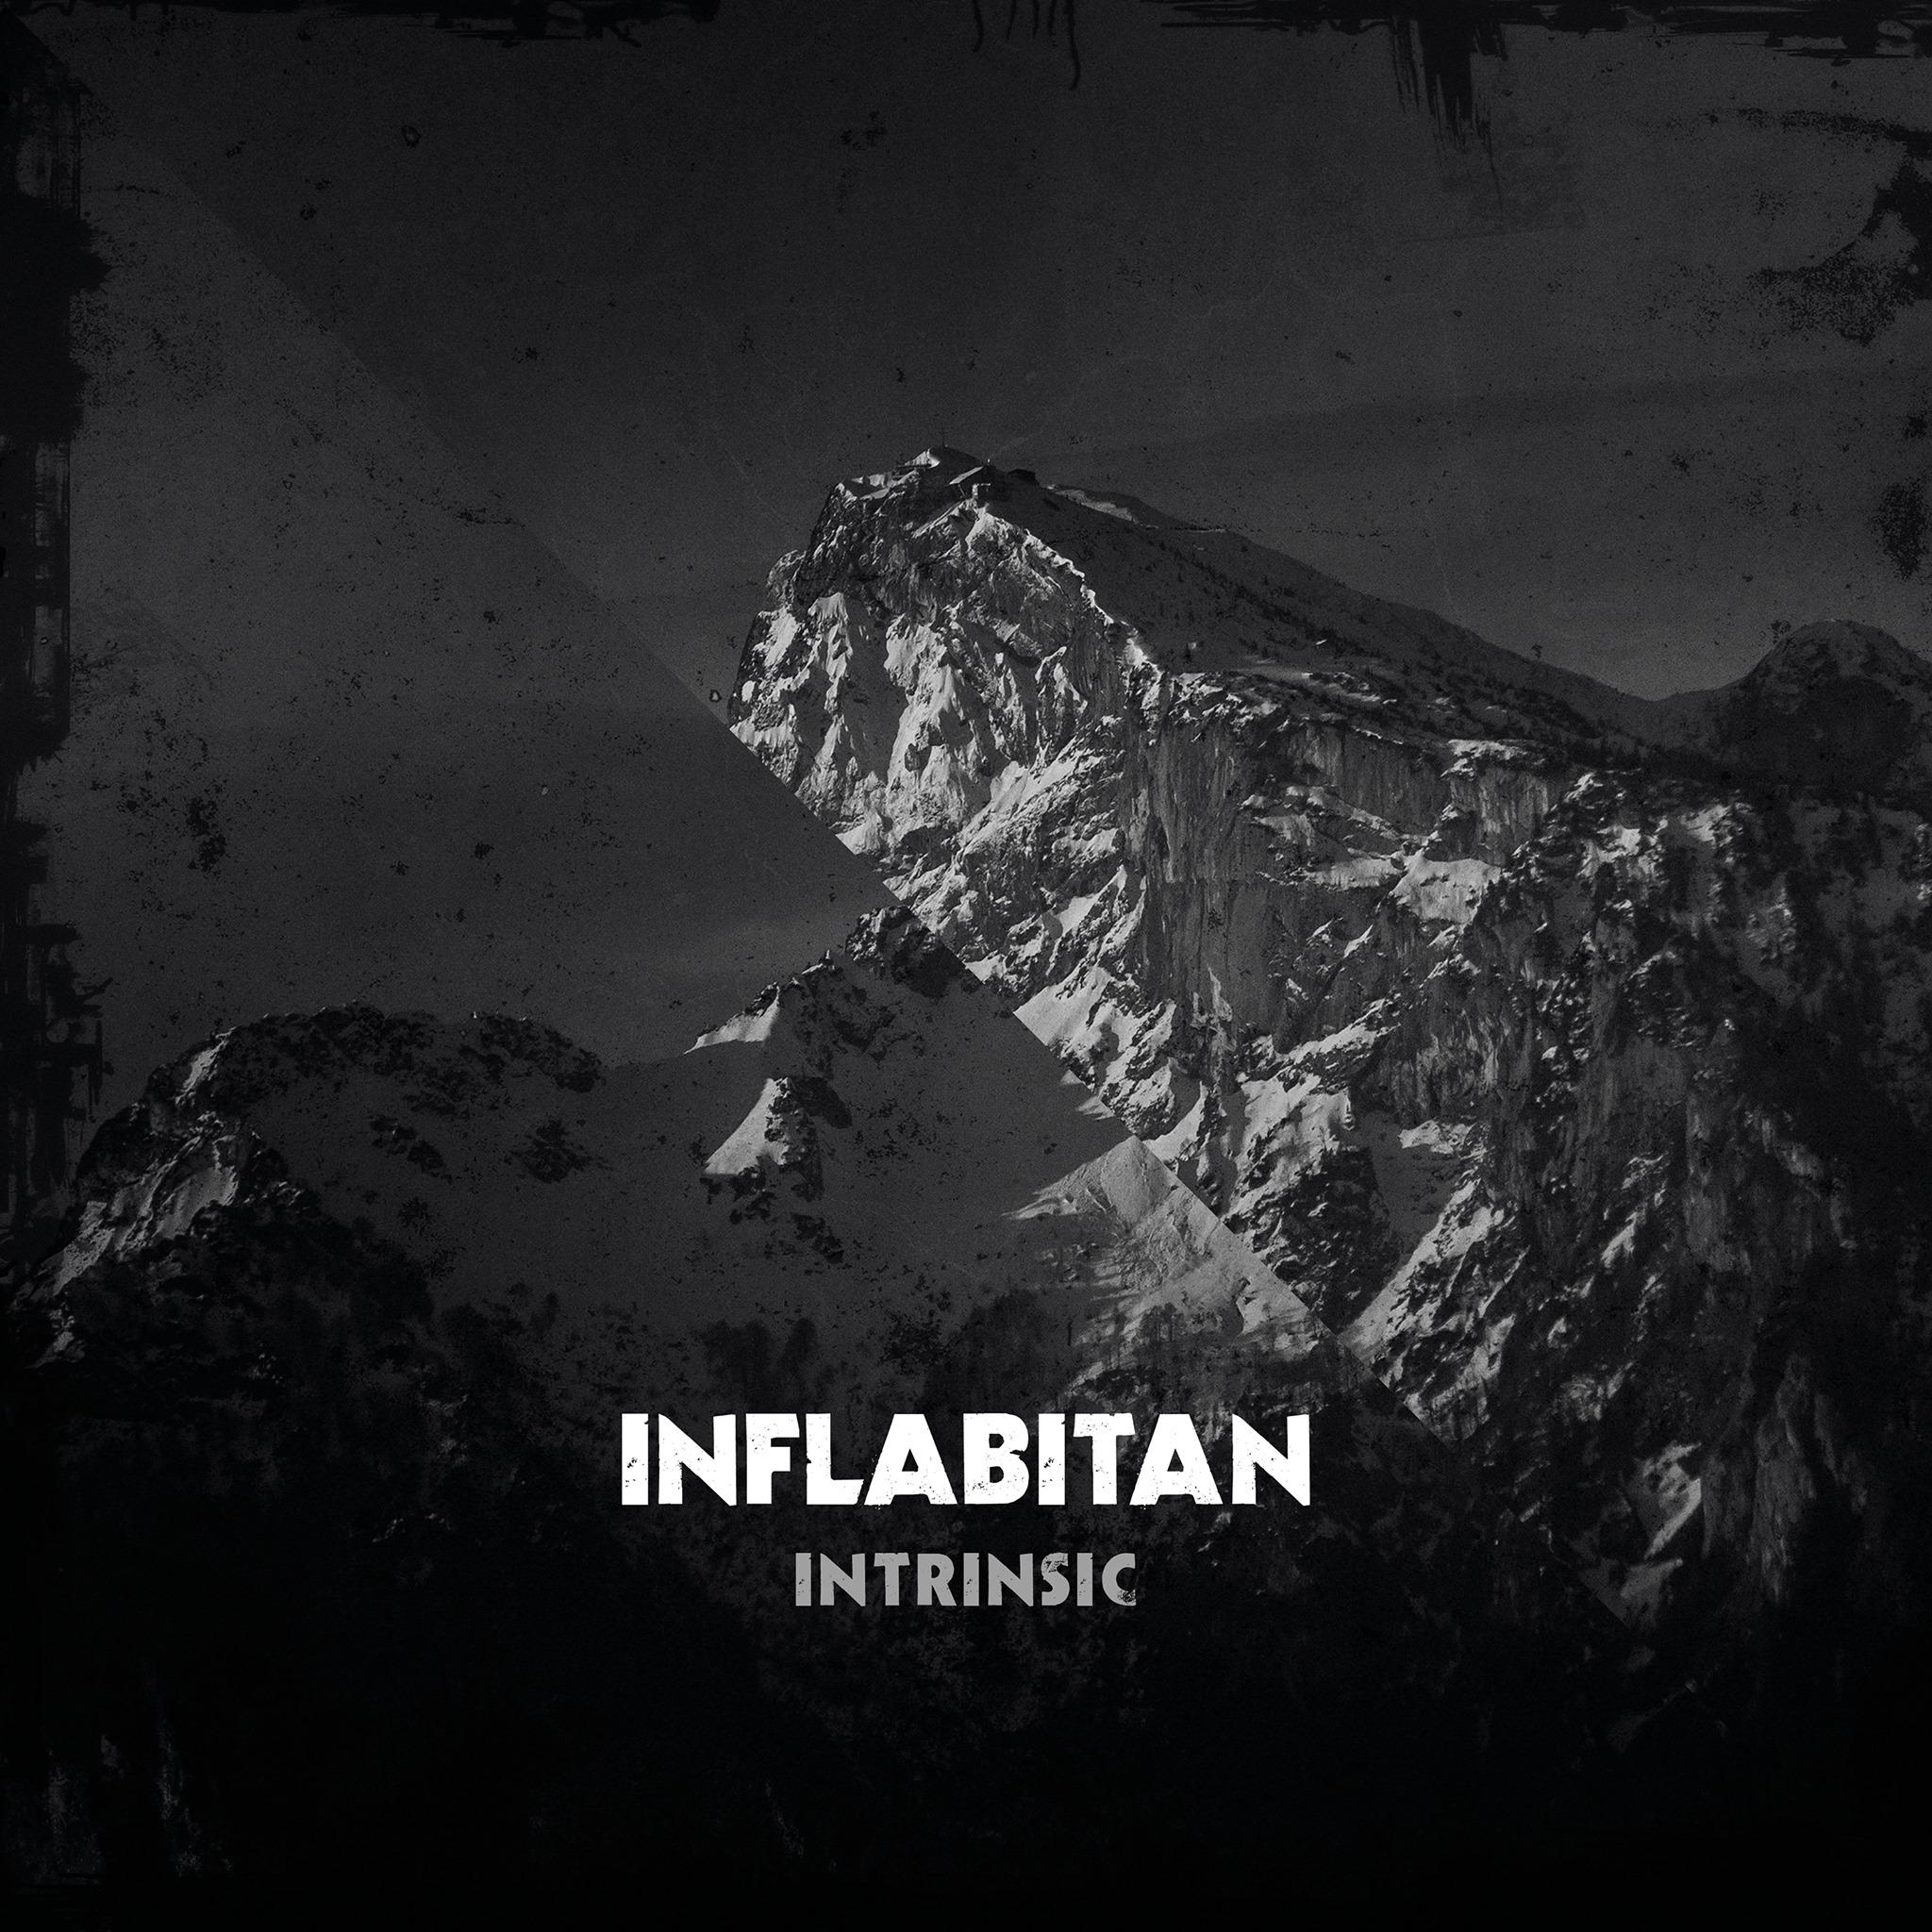 inflabitan intrinsic album cover artwork